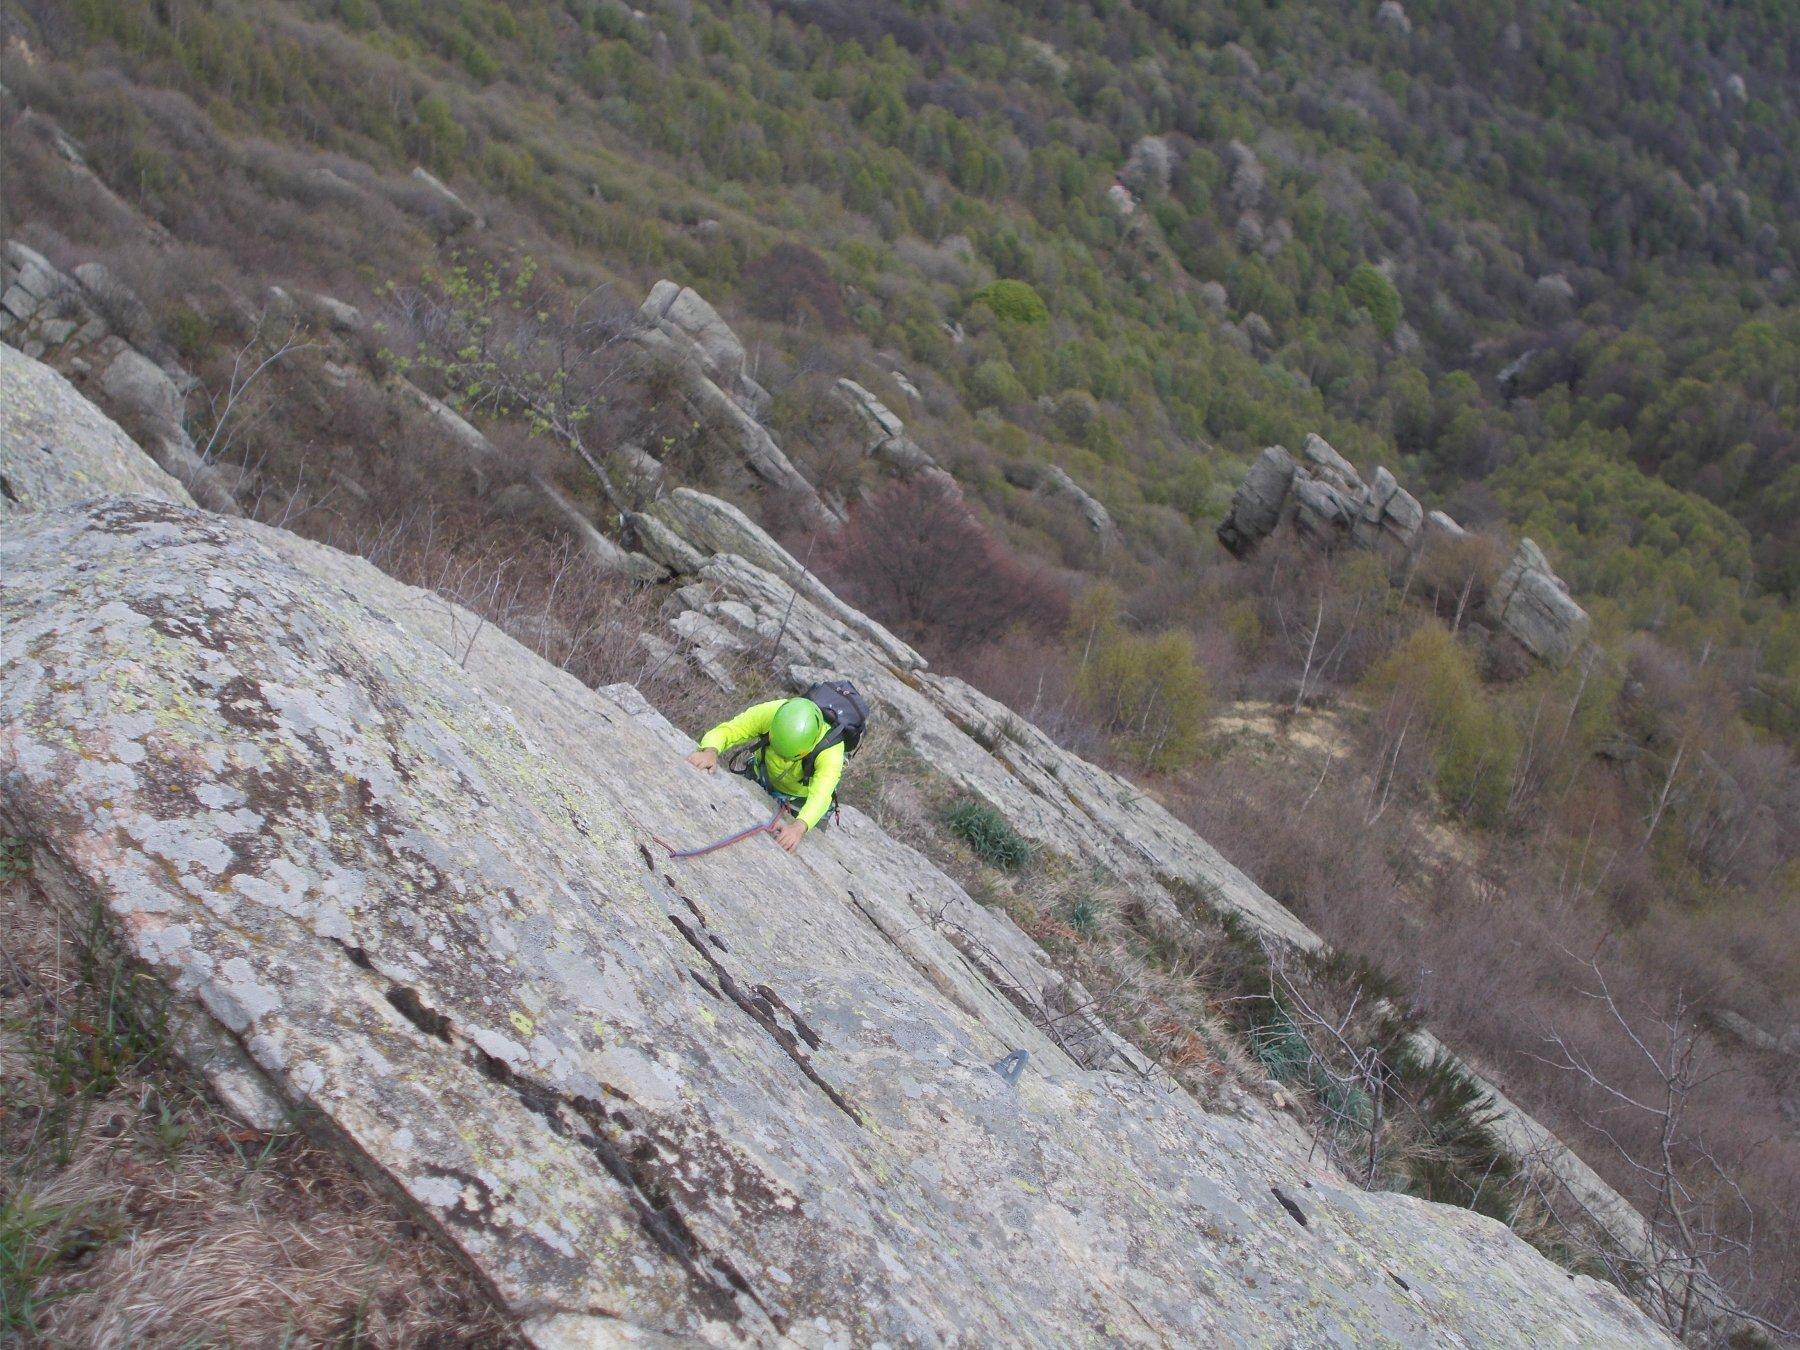 San Bernardo (Monte) Super Rustica 2019-04-26